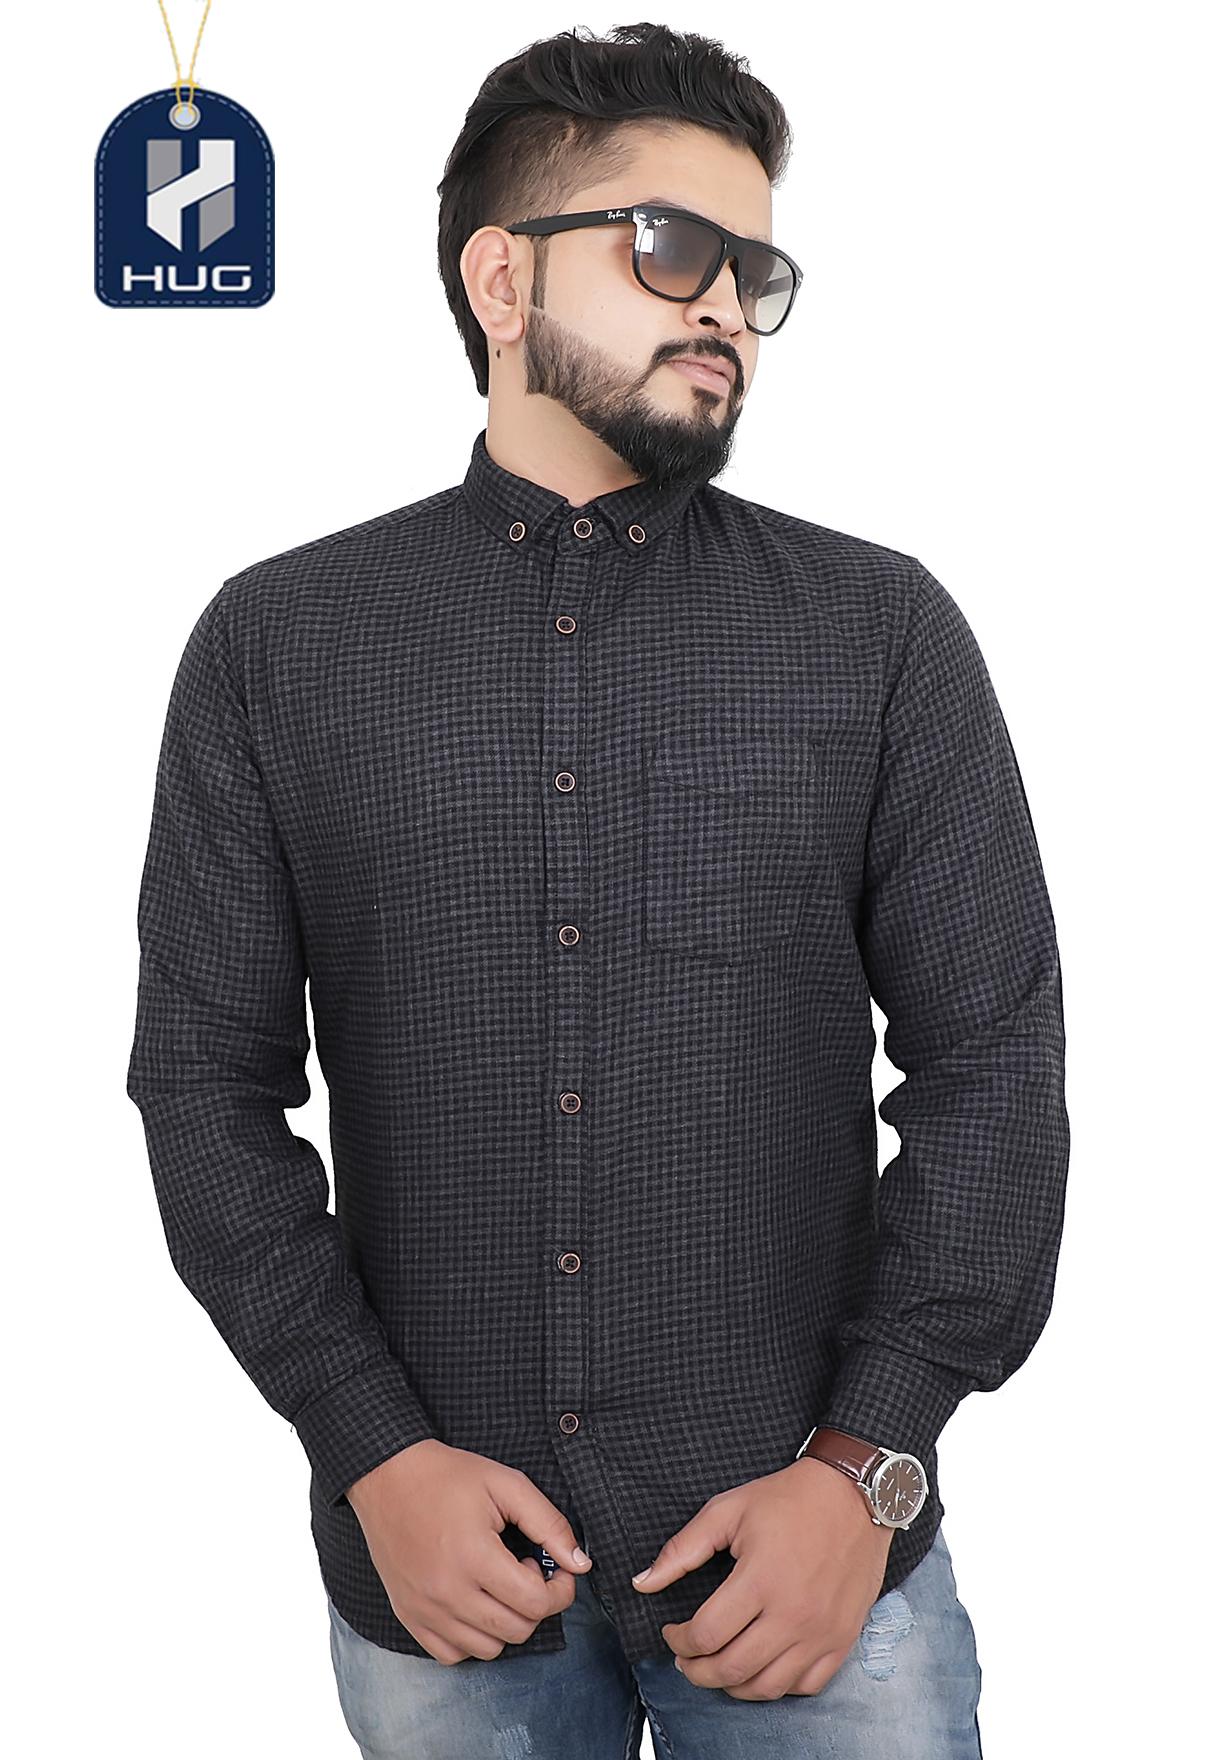 HUG Mens Casual Shirts Size M - SCBL0106